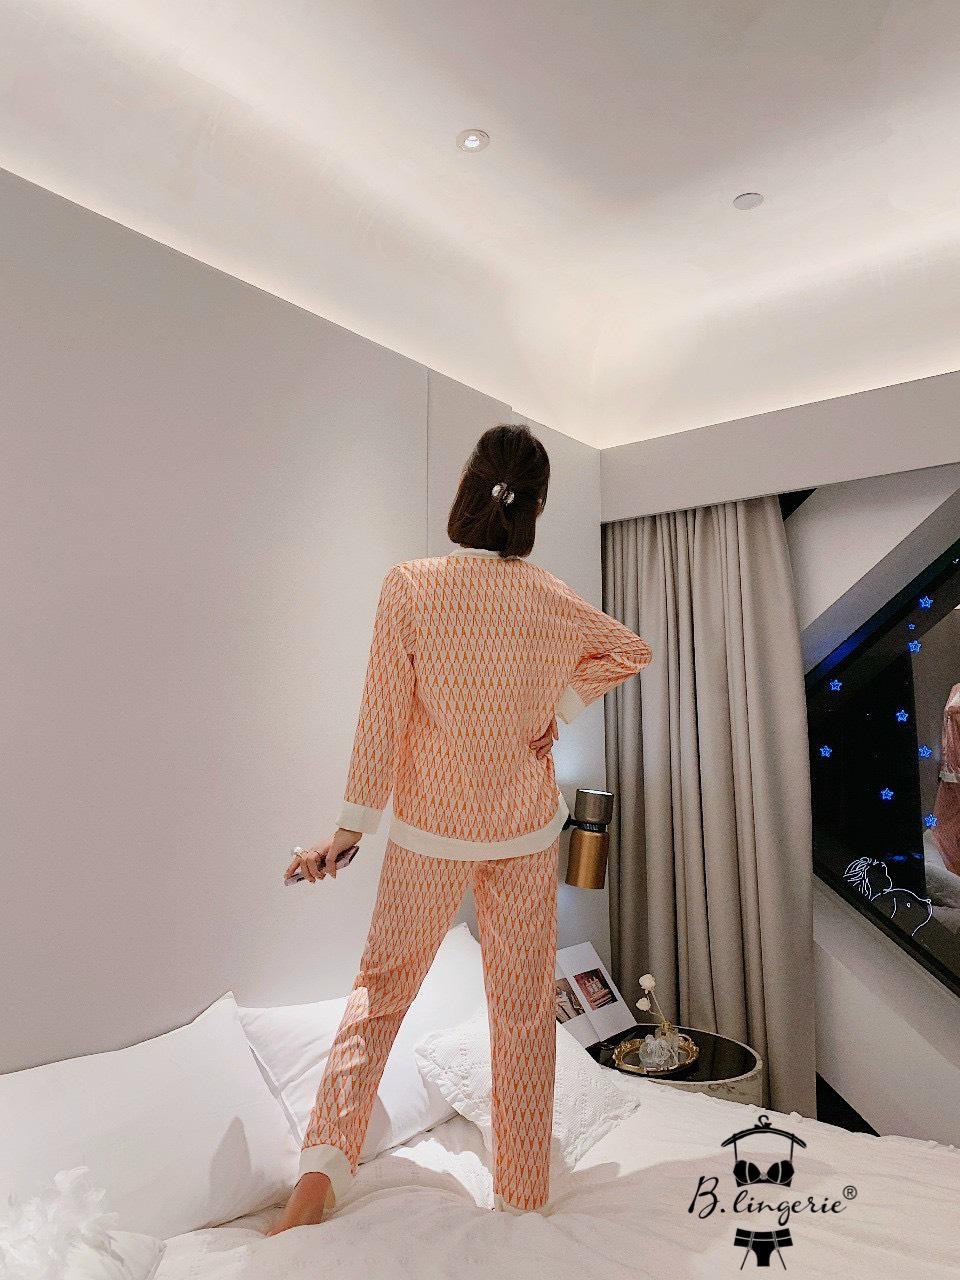 Đồ Pyjama Nữ Tay Dài Blingerie